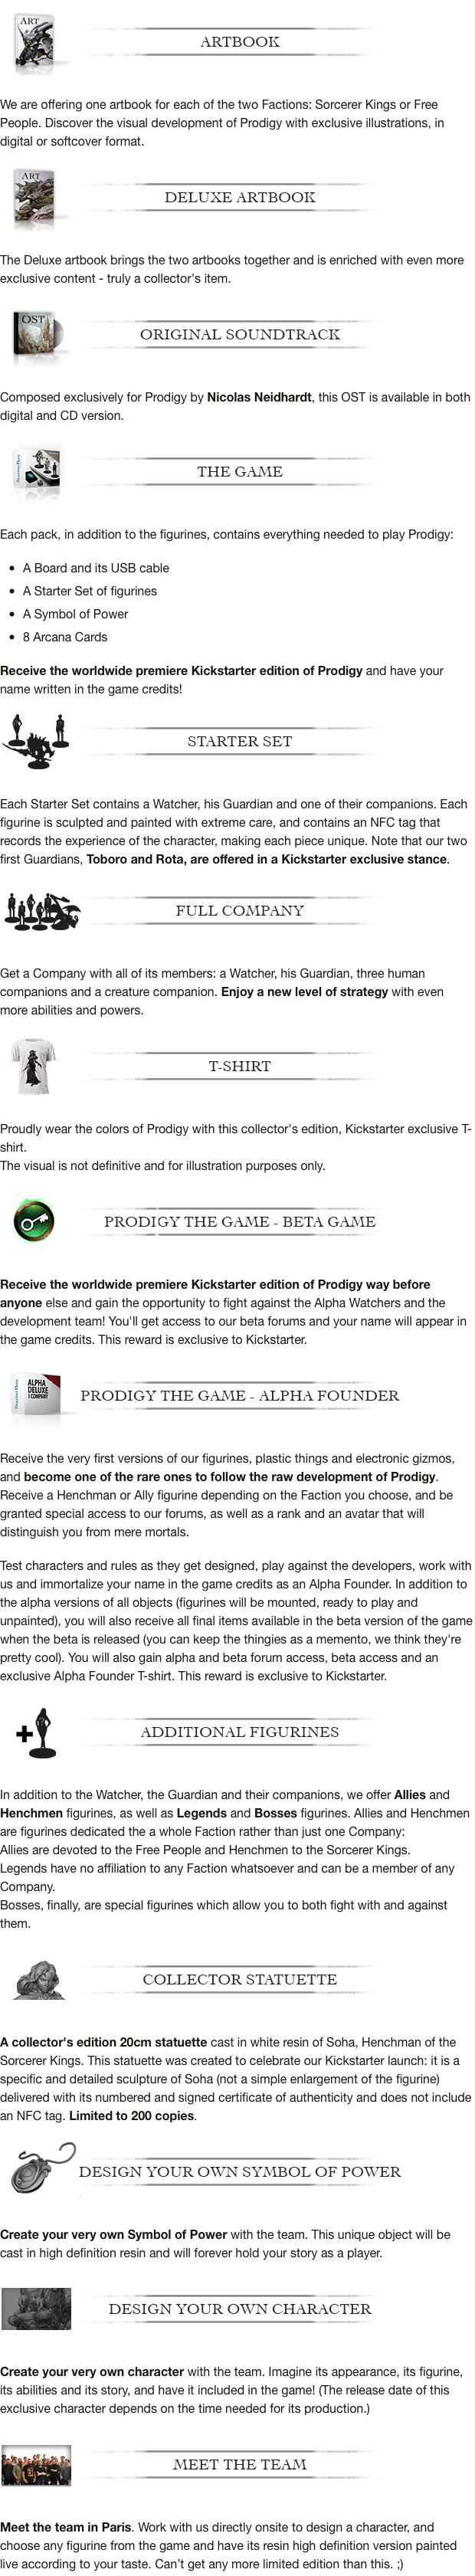 Prodigy the Game by Hanakai Studio — Kickstarter